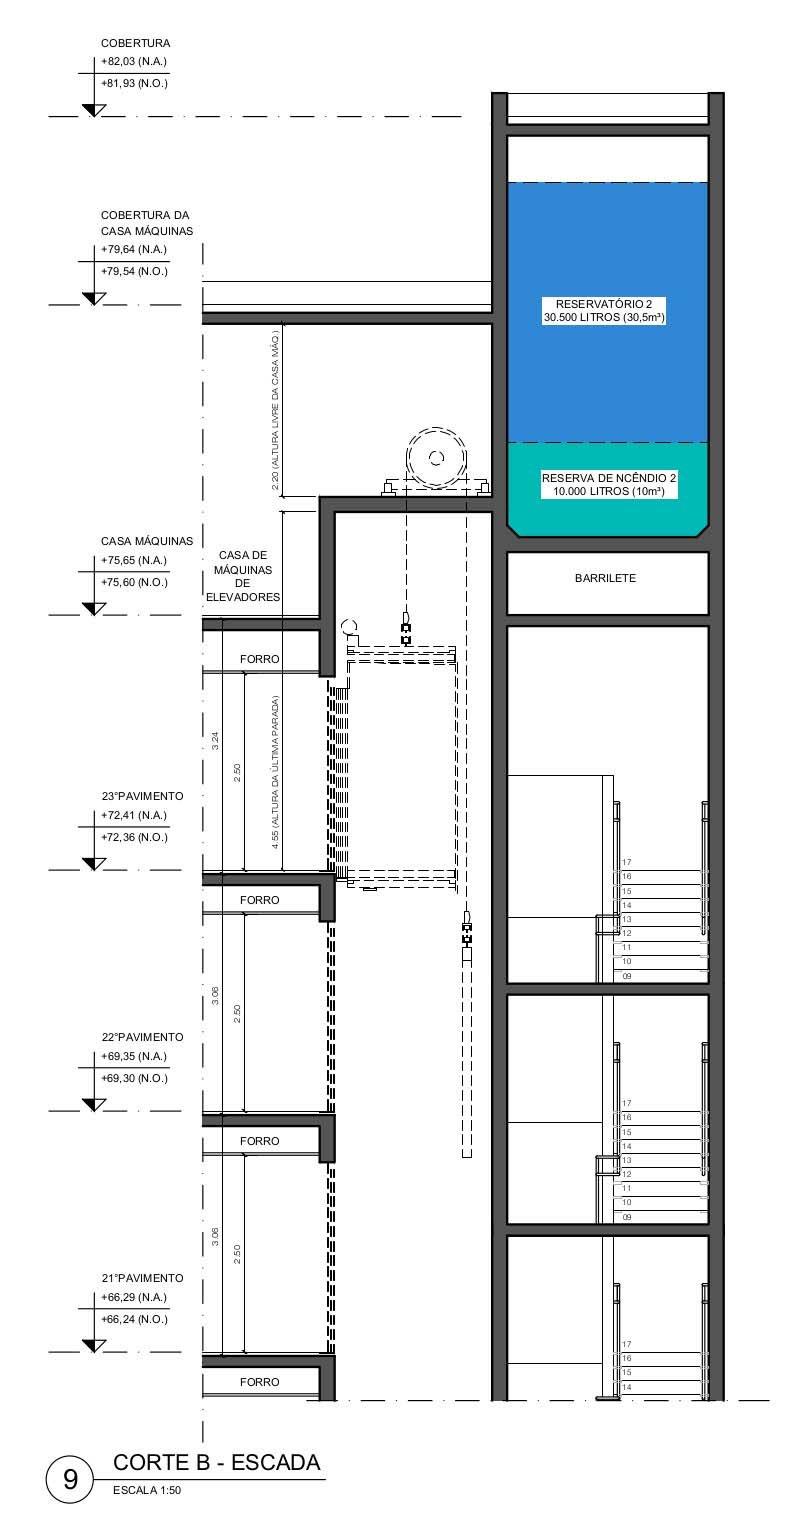 Corte B - Escada